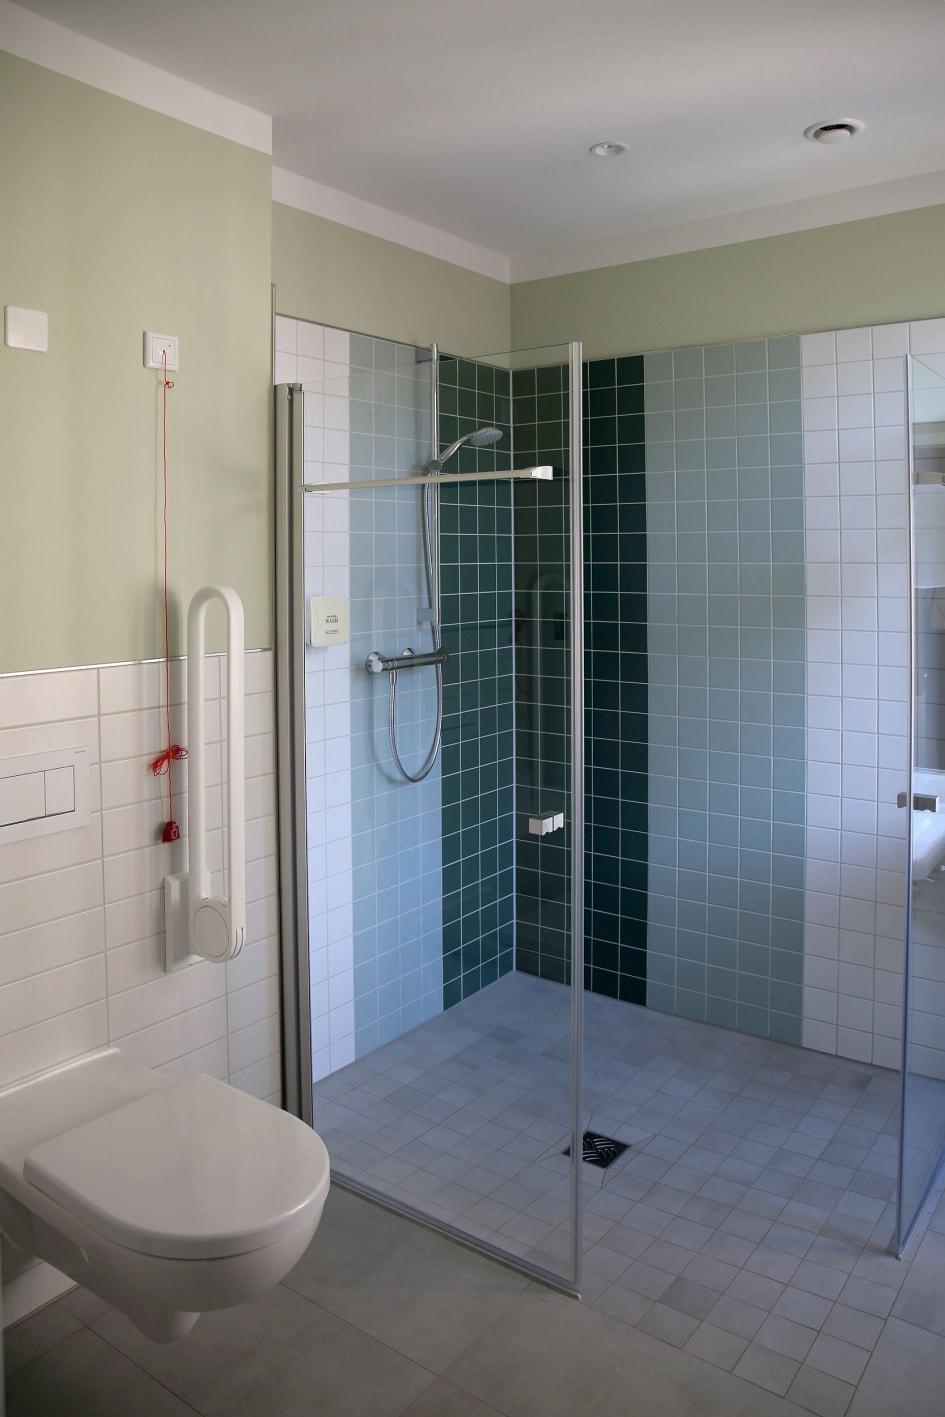 Behindertengerechtes Badezimmer.Integrationshotel Philippus Behindertengerechtes Badezimmer